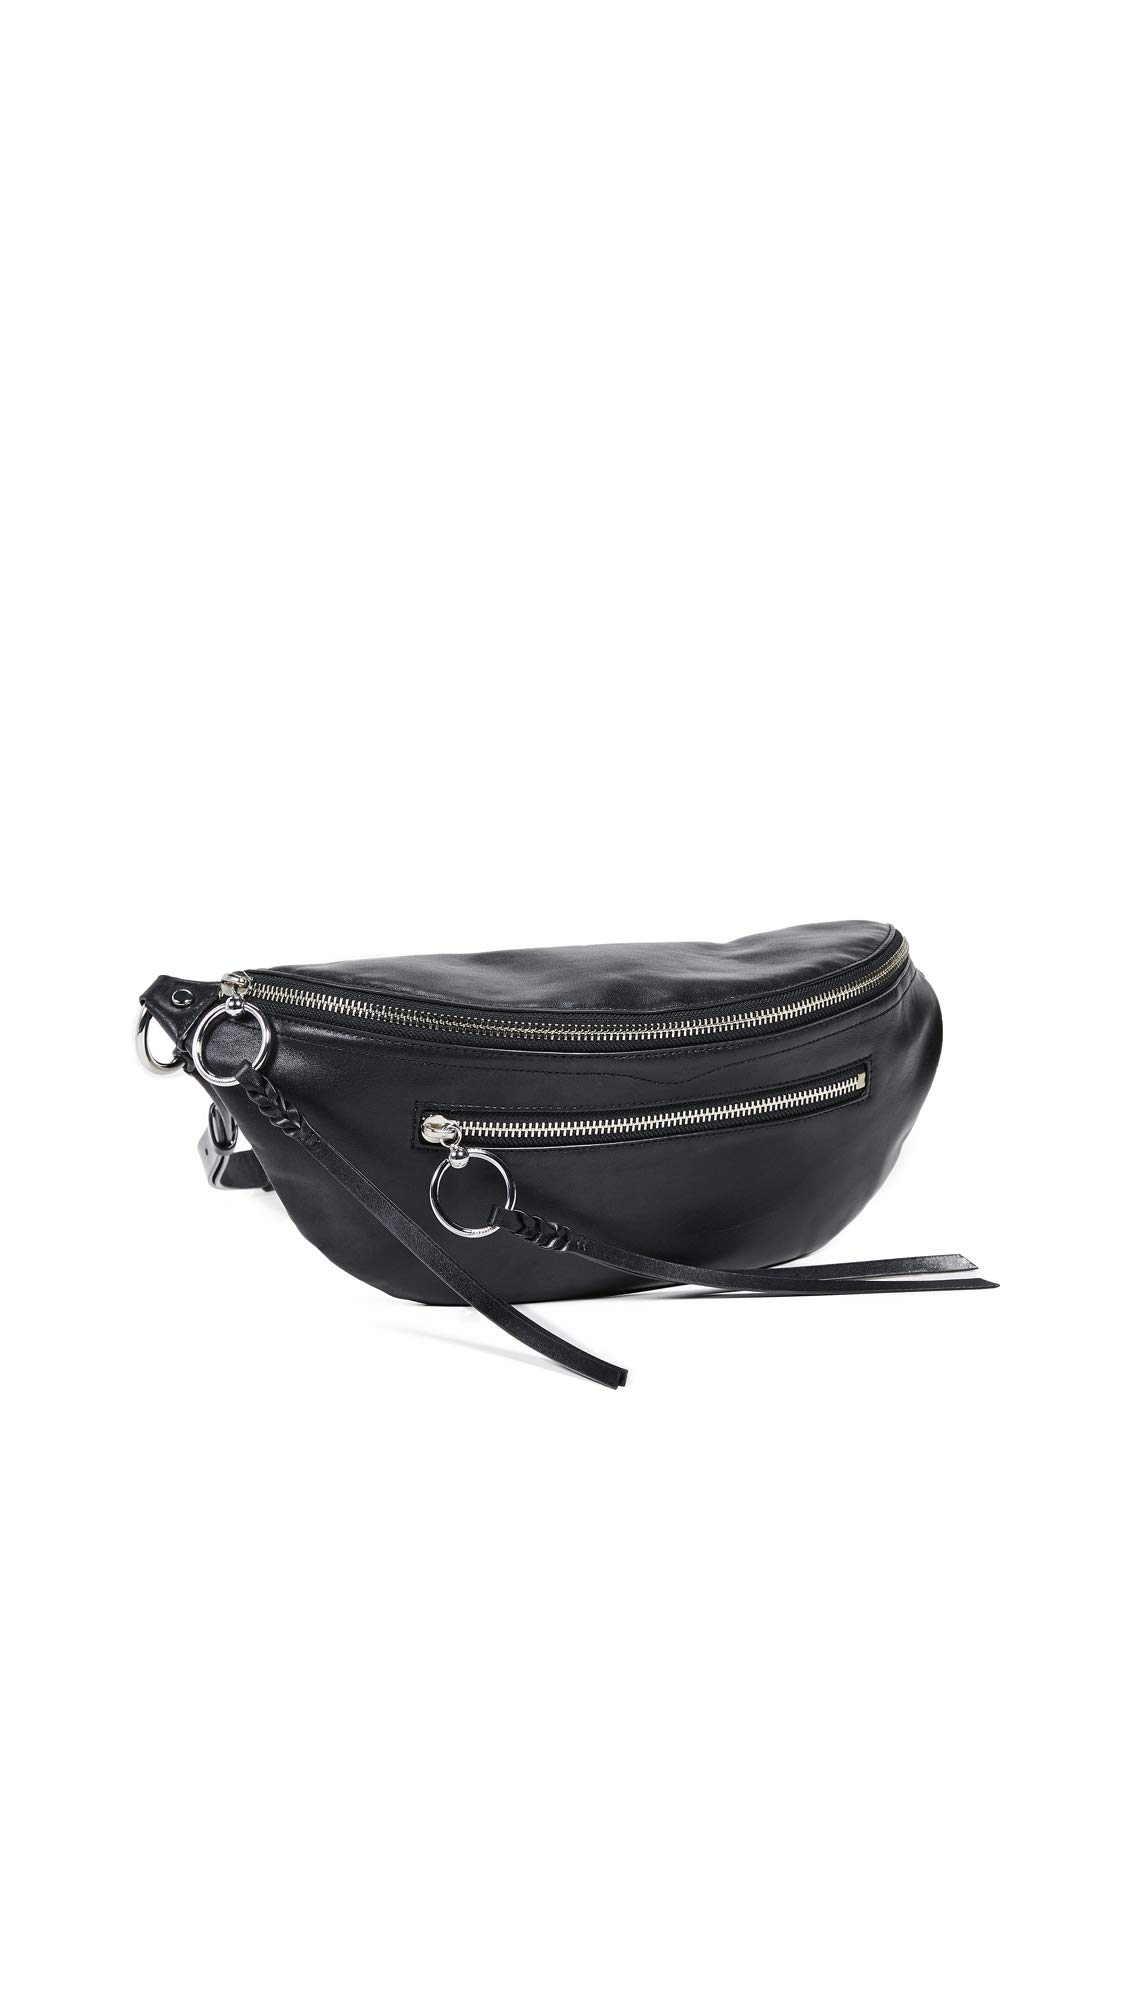 Rebecca Minkoff Women's Bree Large Zip Sling Bag, Black, One Size